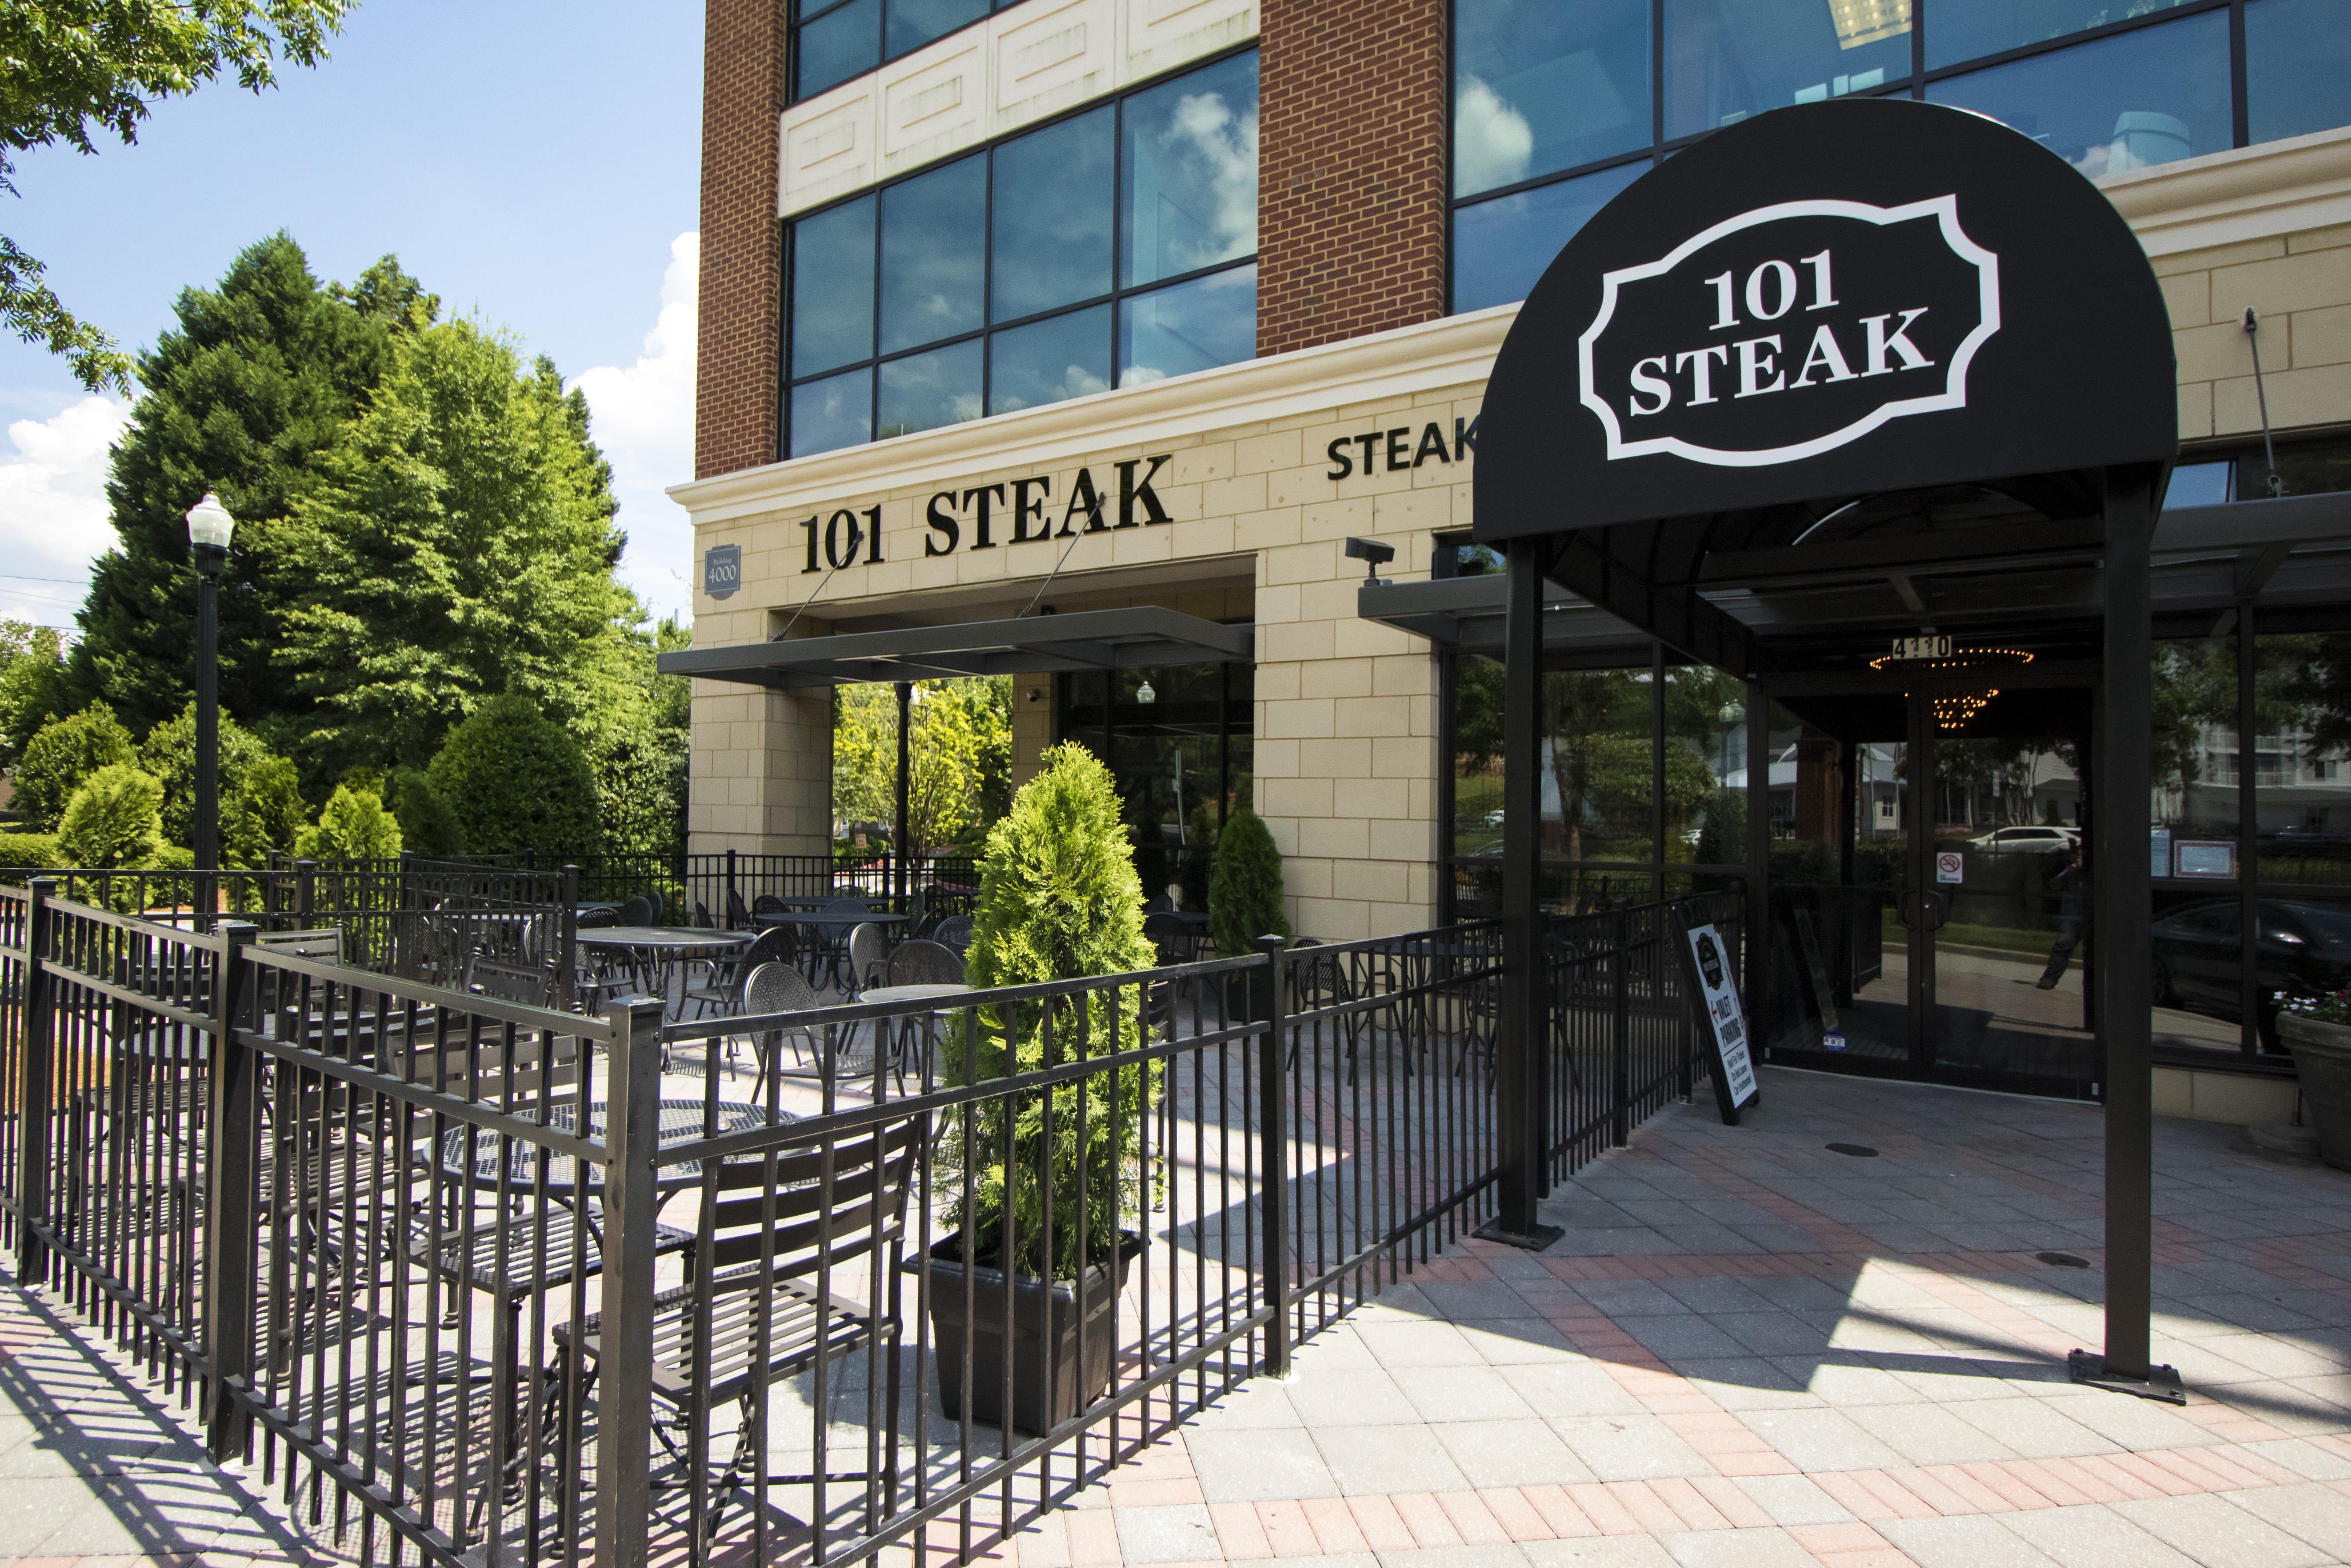 Exterior view of 101 Steak.